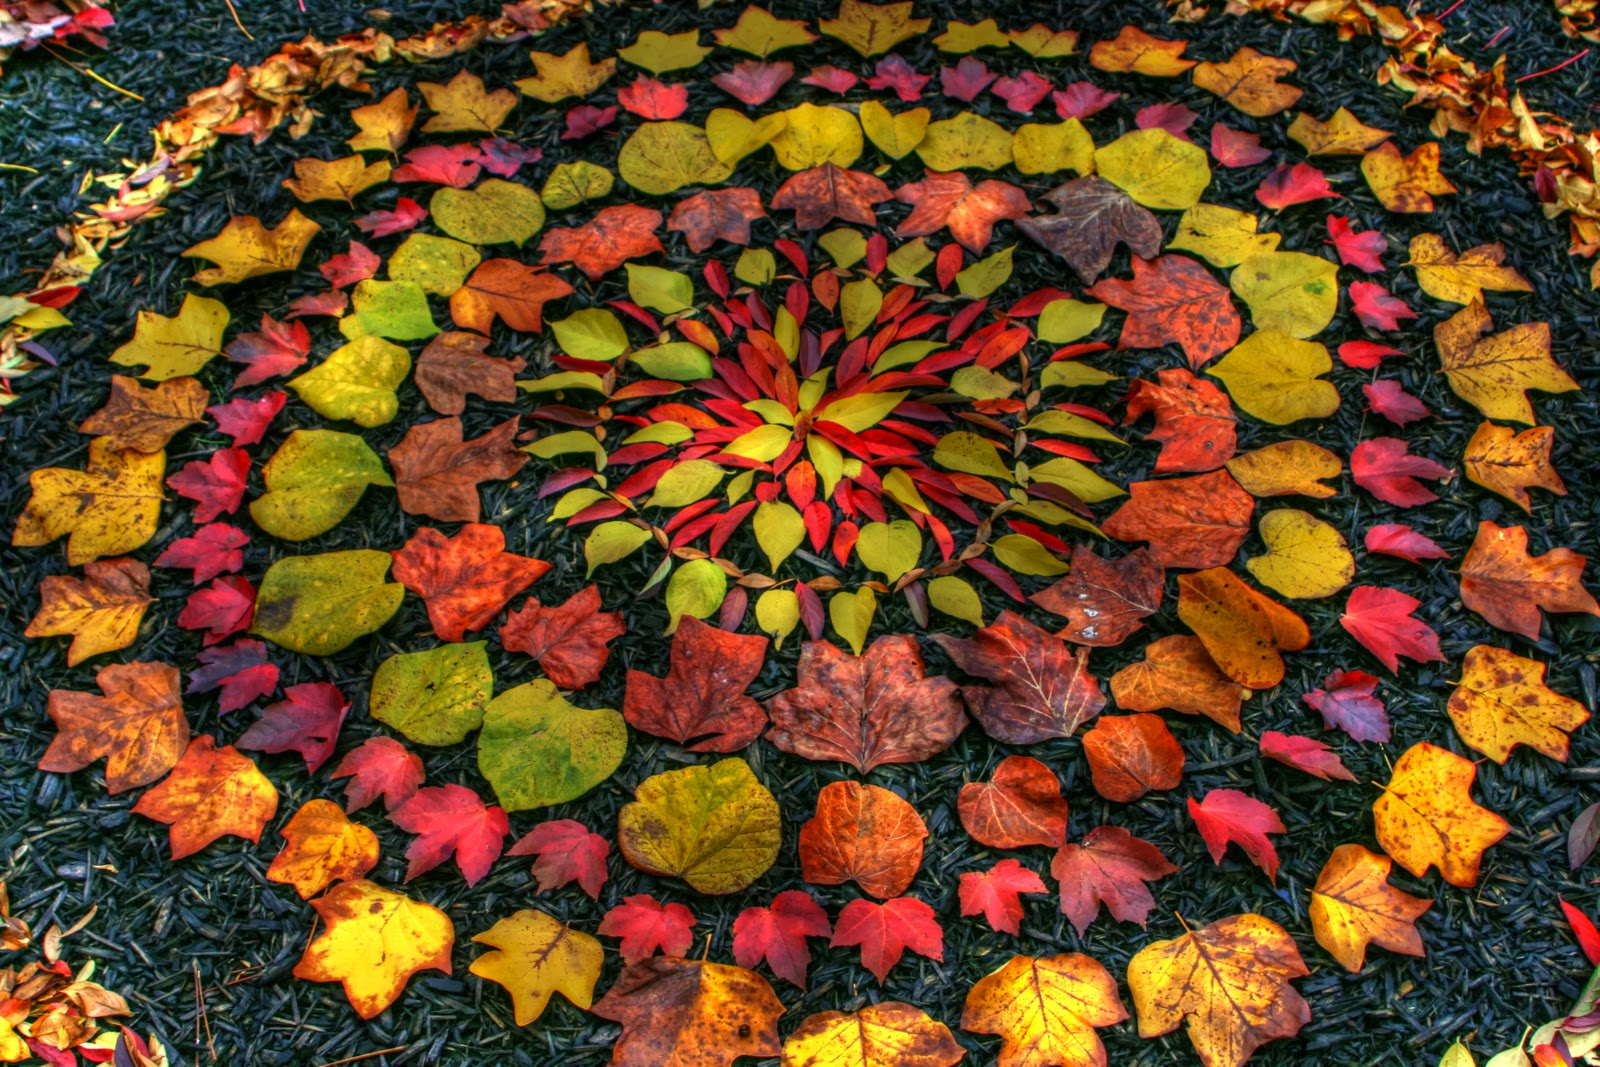 Scottish Artist Andy Goldsworthy Enhances Nature The Rongolian Star